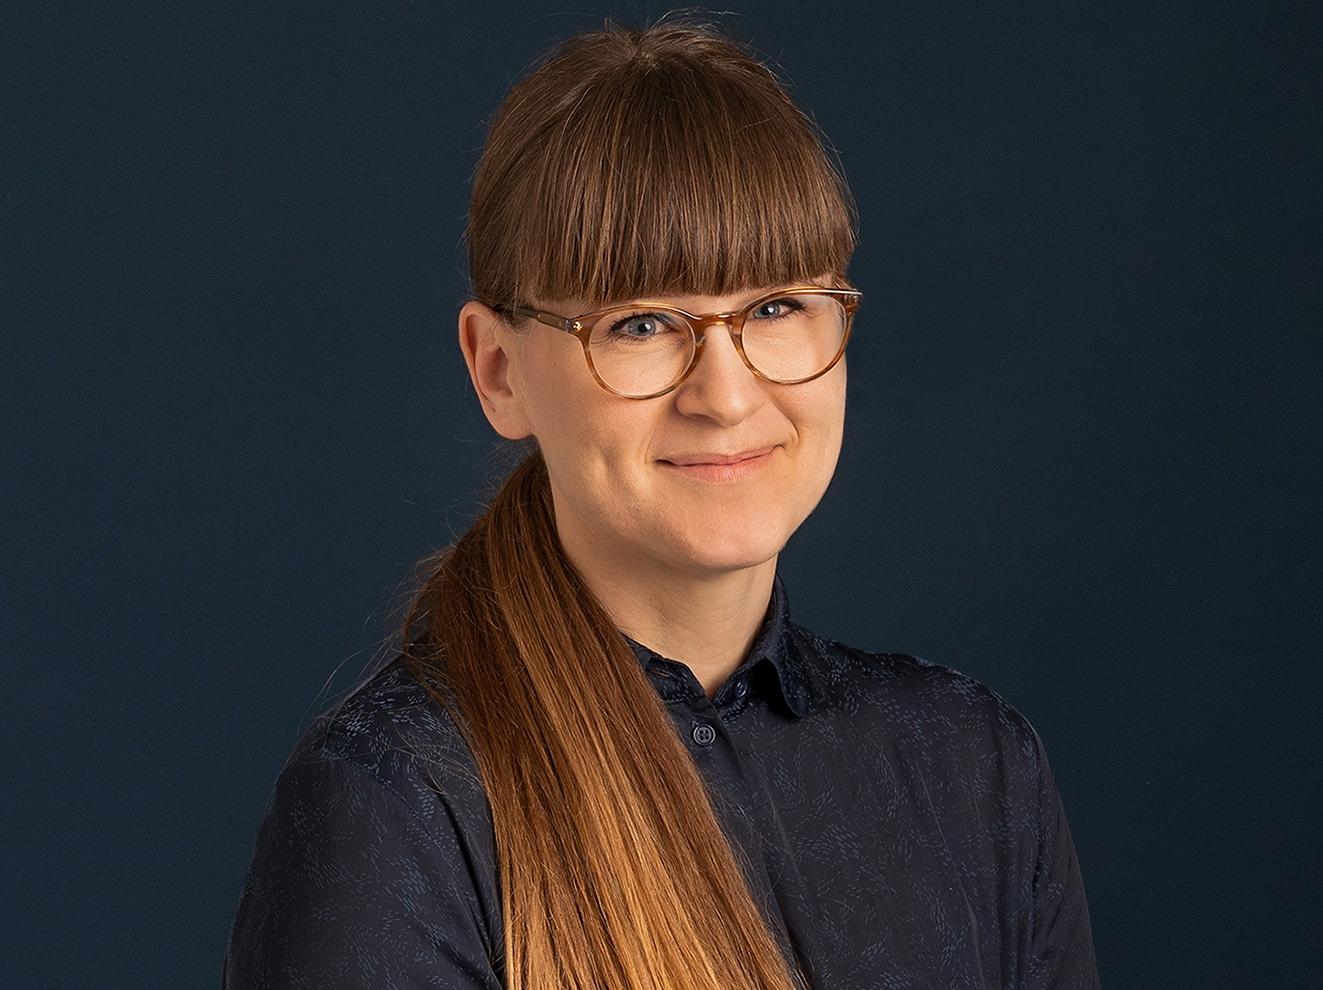 Trine Hjorth Bønnerup